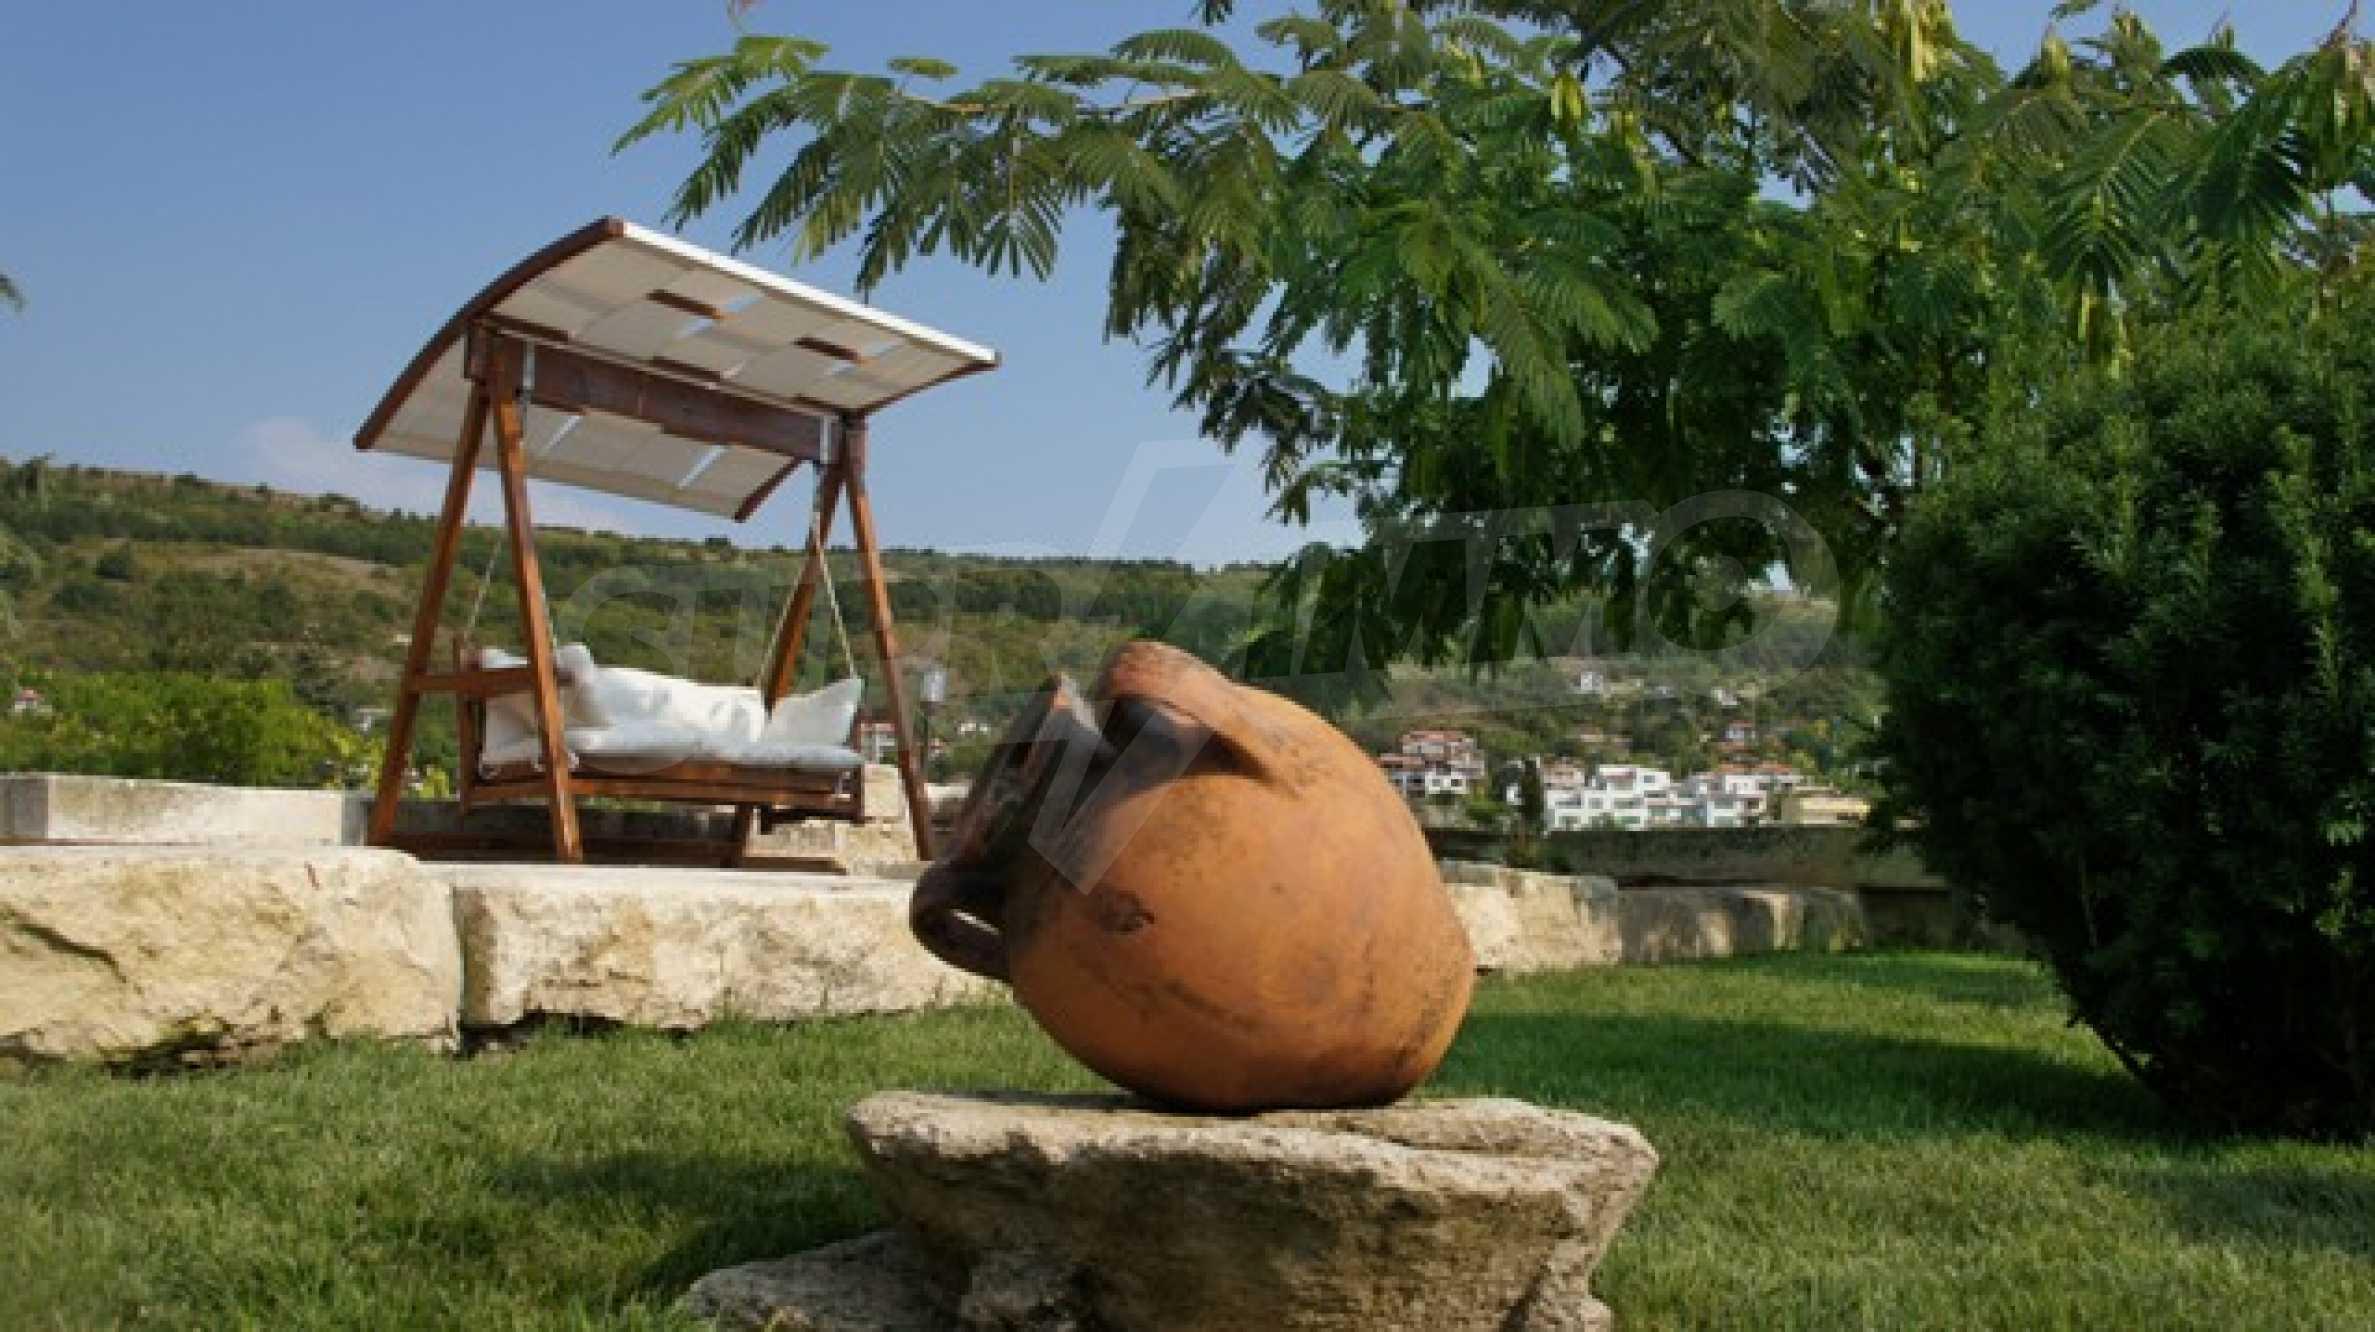 The Mediterranean style - a sense of luxury 20